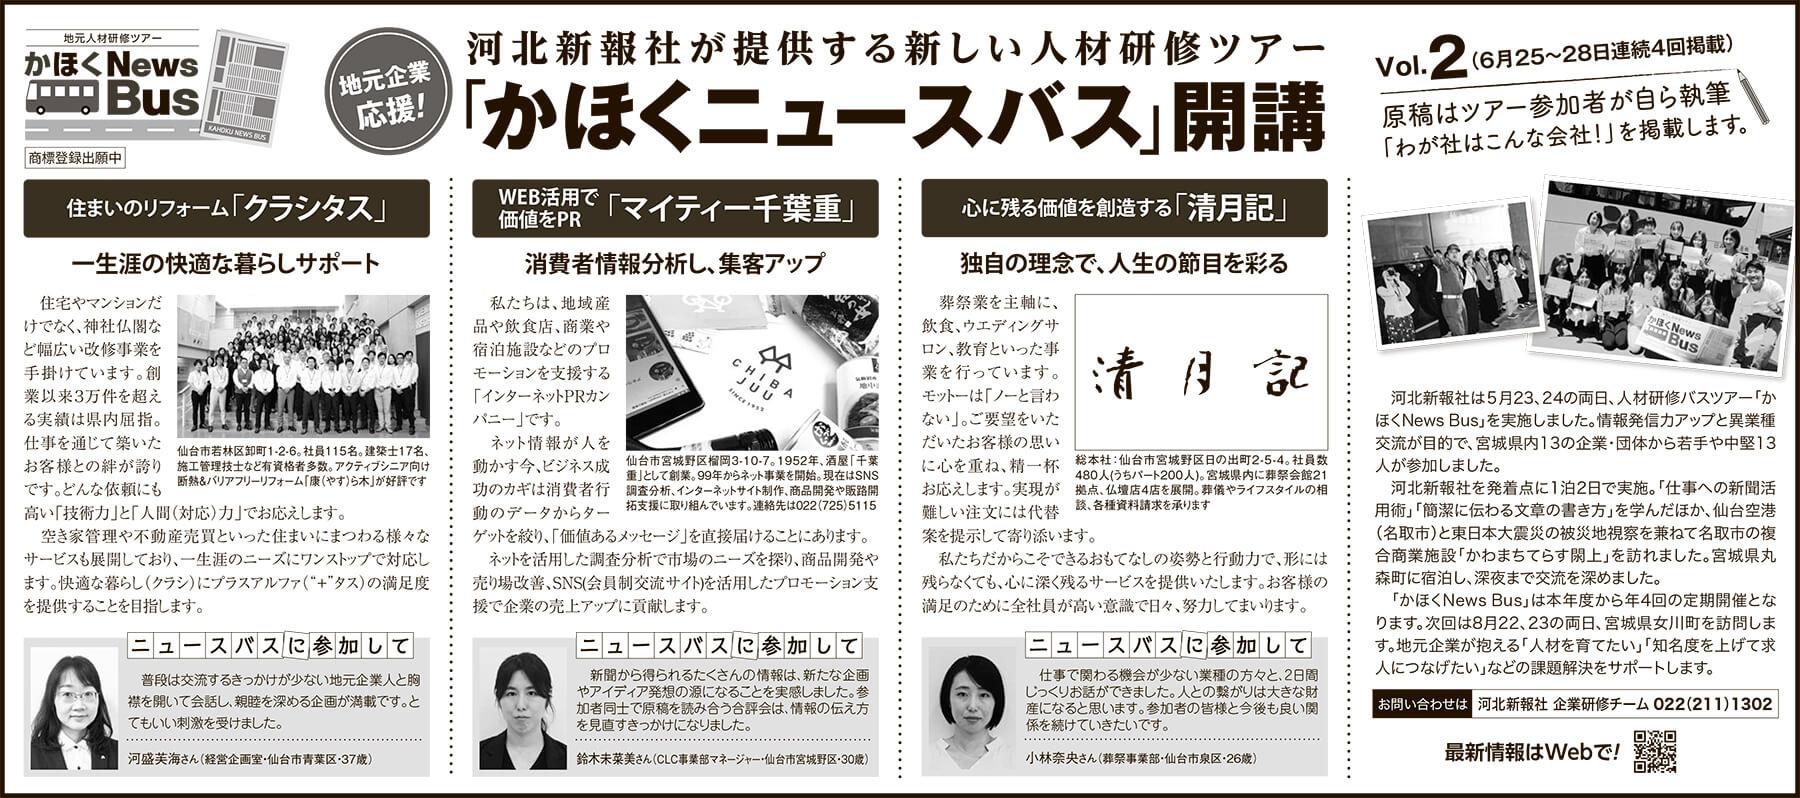 2019News_Bus_5d_総合-2.jpg